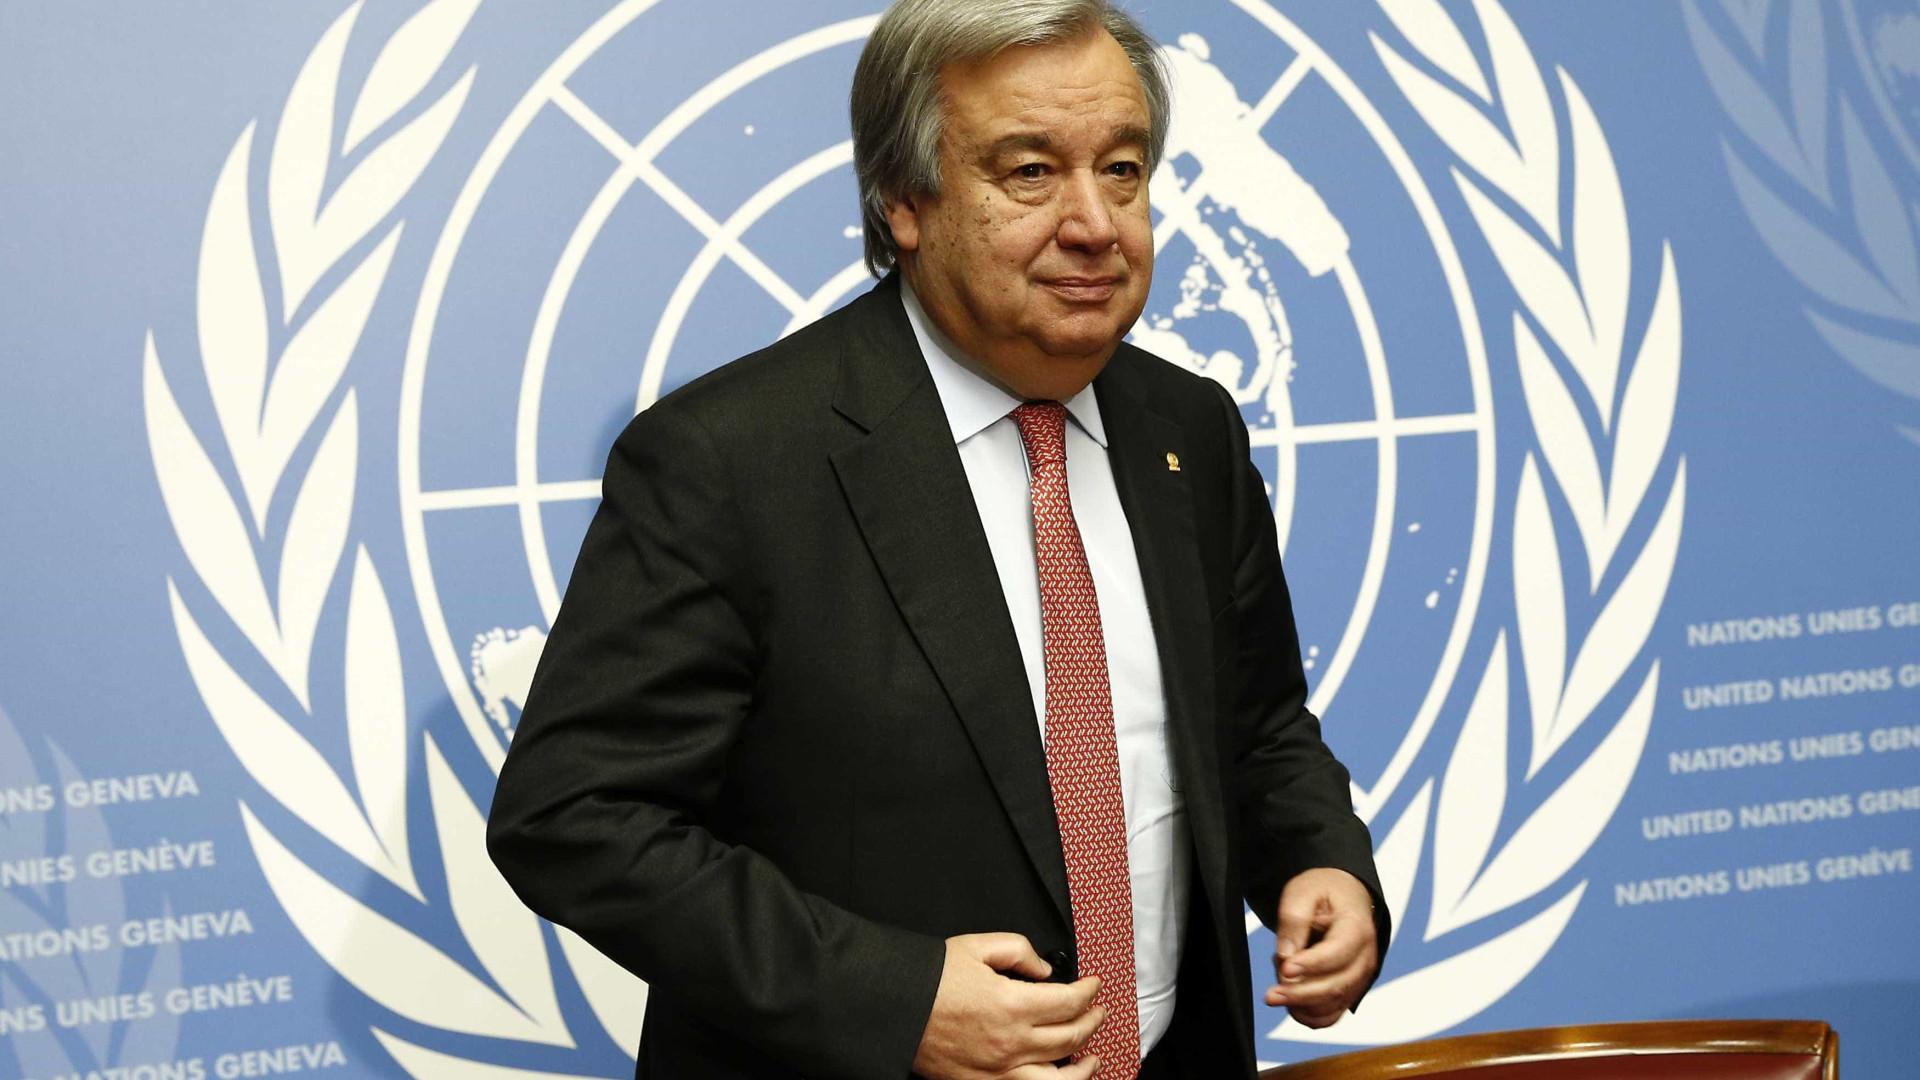 Guterres apoia paz na Colômbia em visita marcada por crise na Venezuela